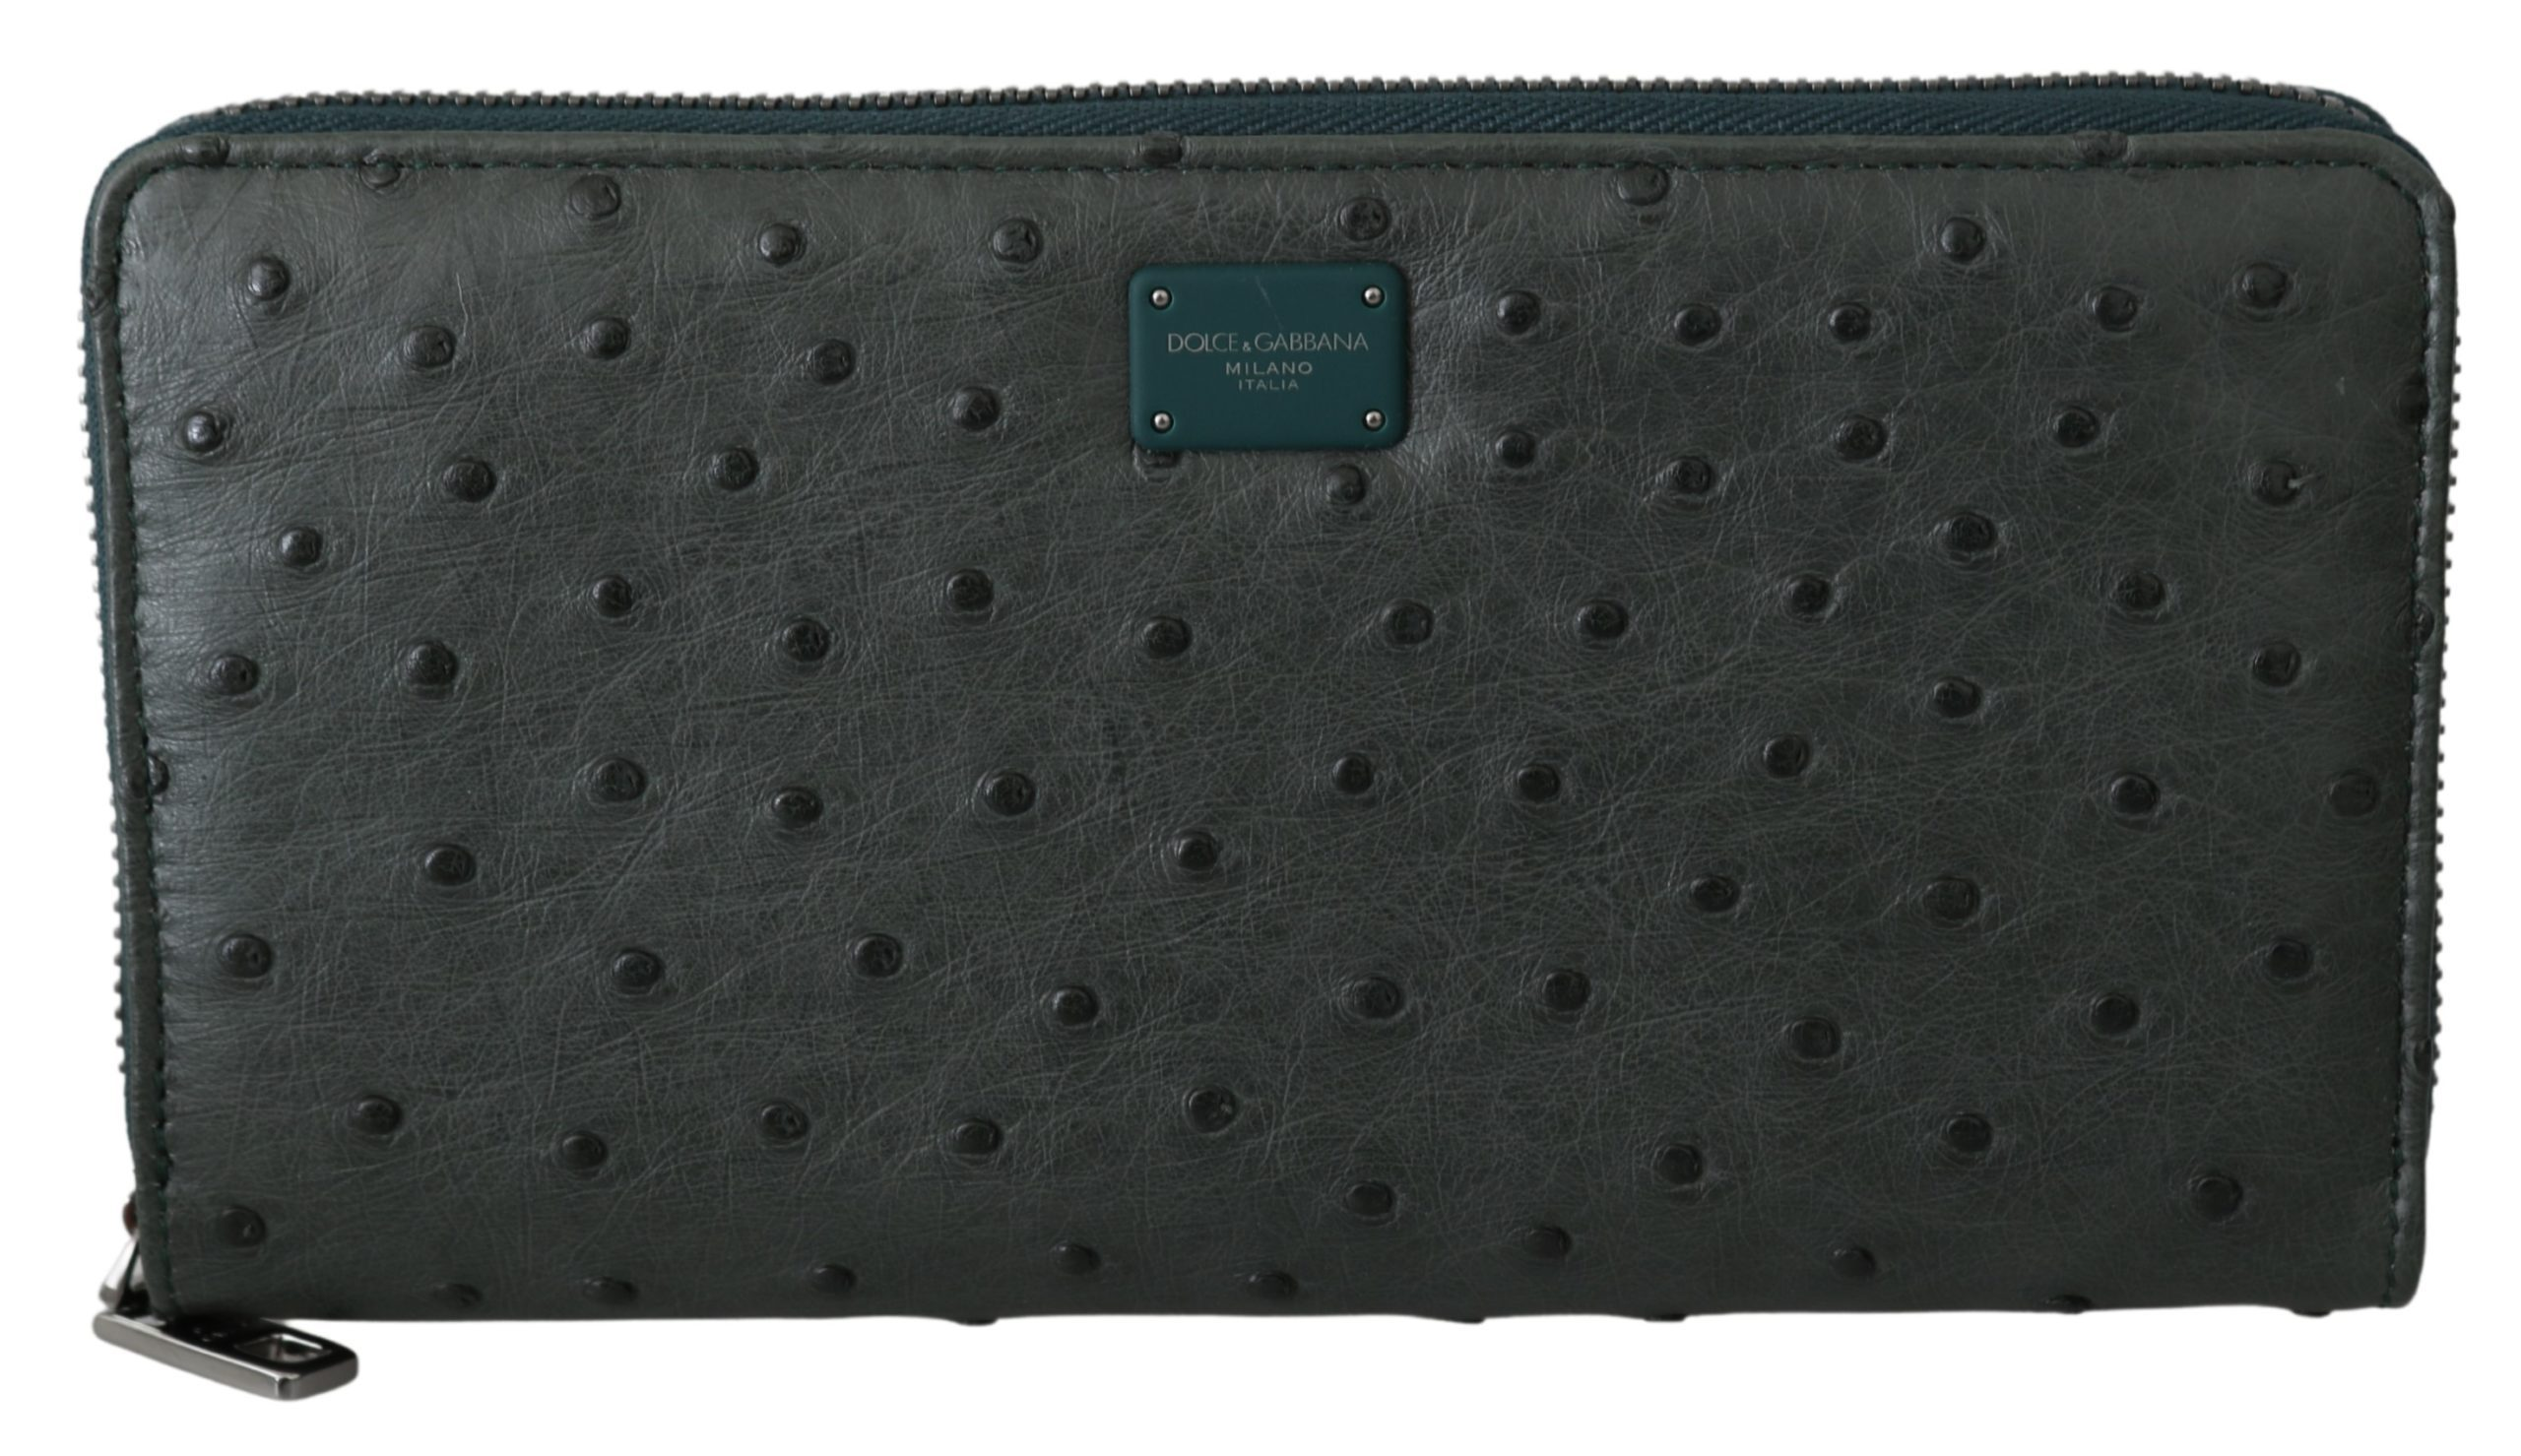 Dolce & Gabbana Men's Ostrich Leather Continental Wallet Green VAS9686